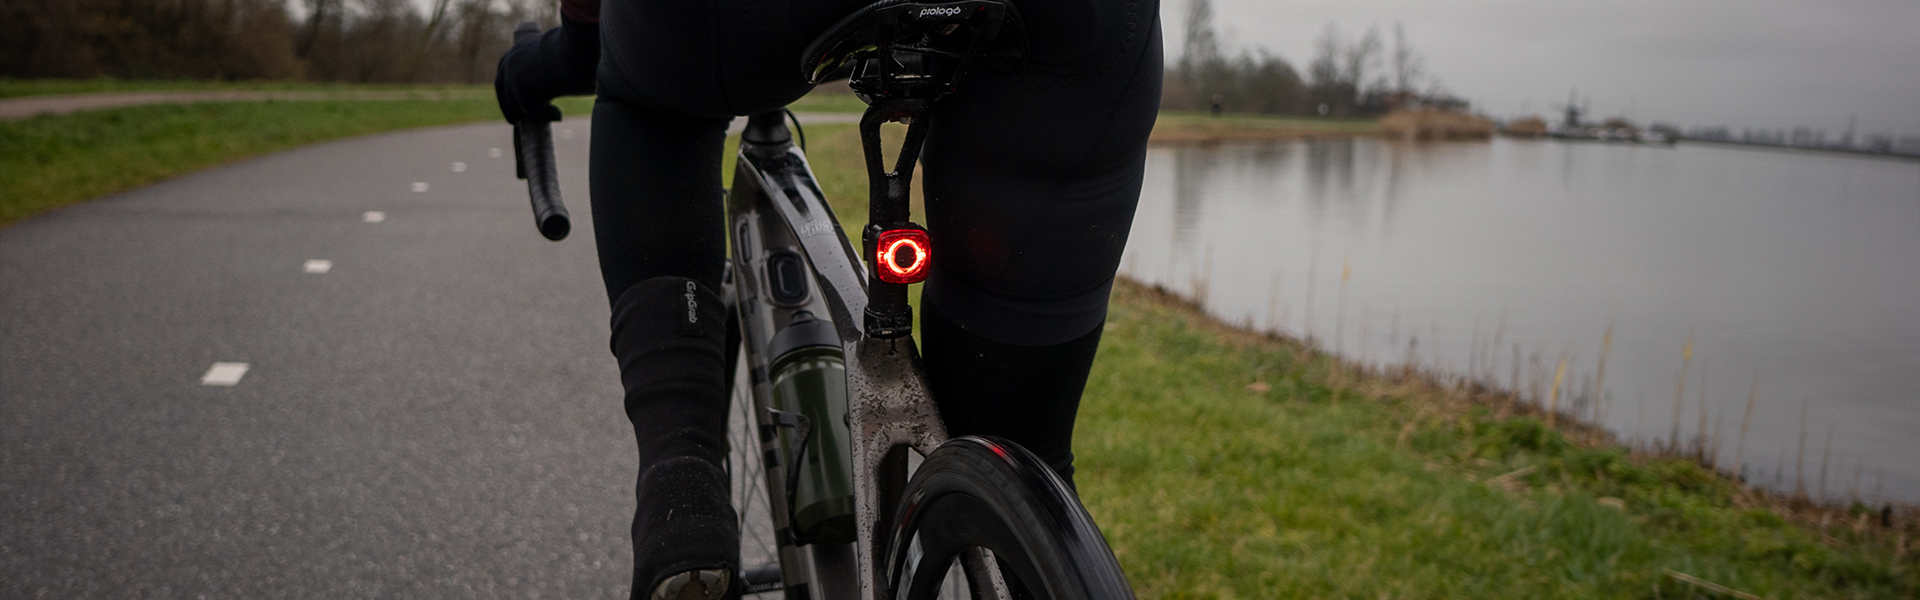 Sate-lite USB rechargeable bike light eletric bike rear light CREE LED waterproof